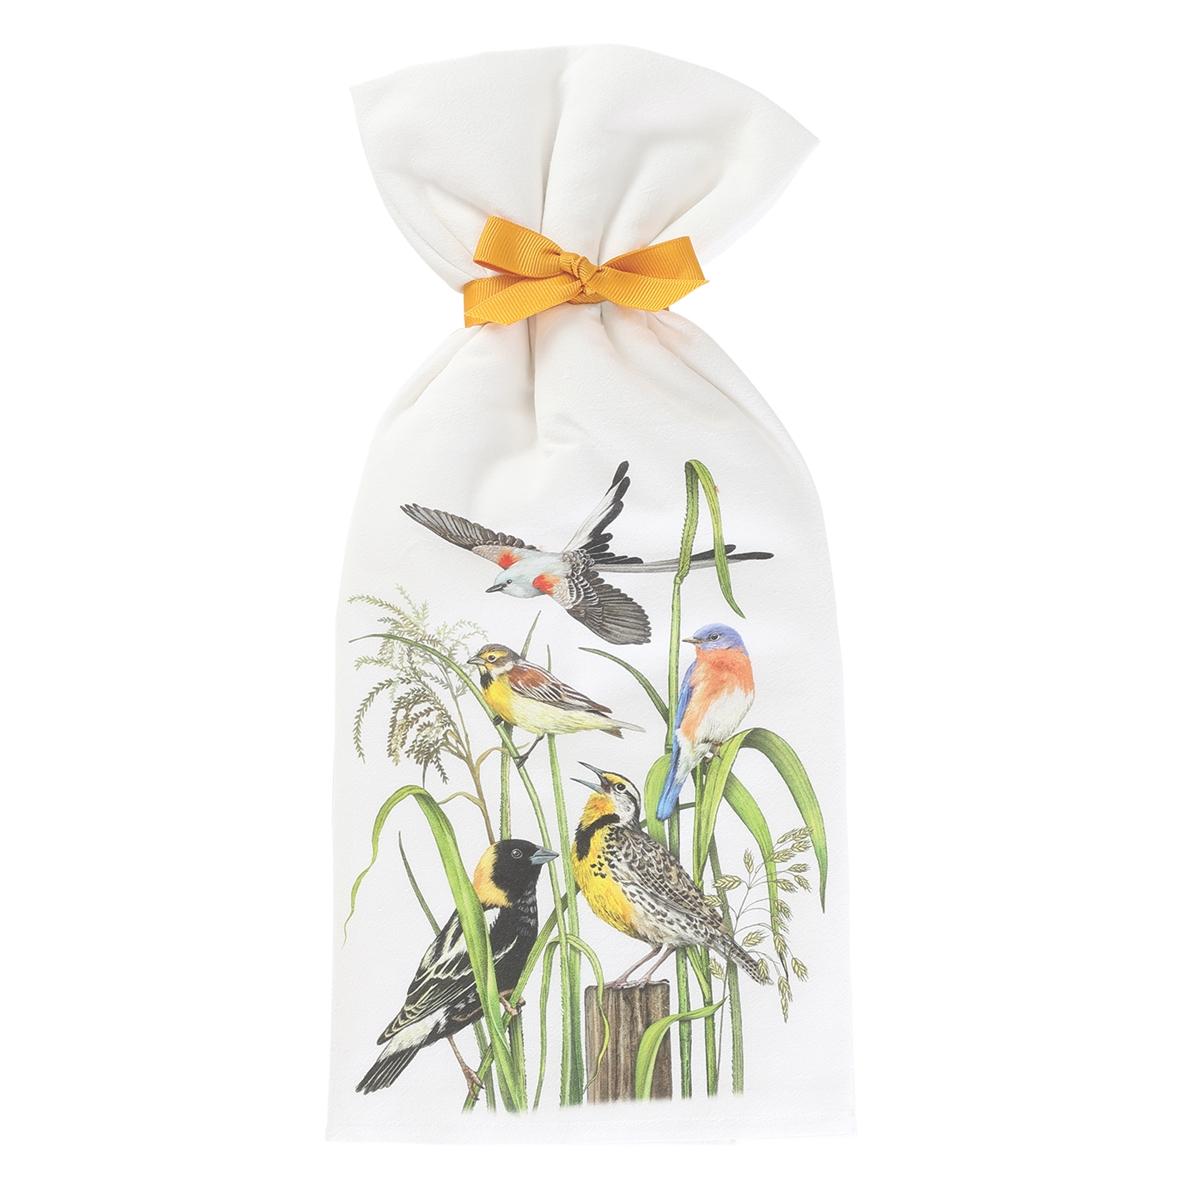 Colorful Birds Towels Set